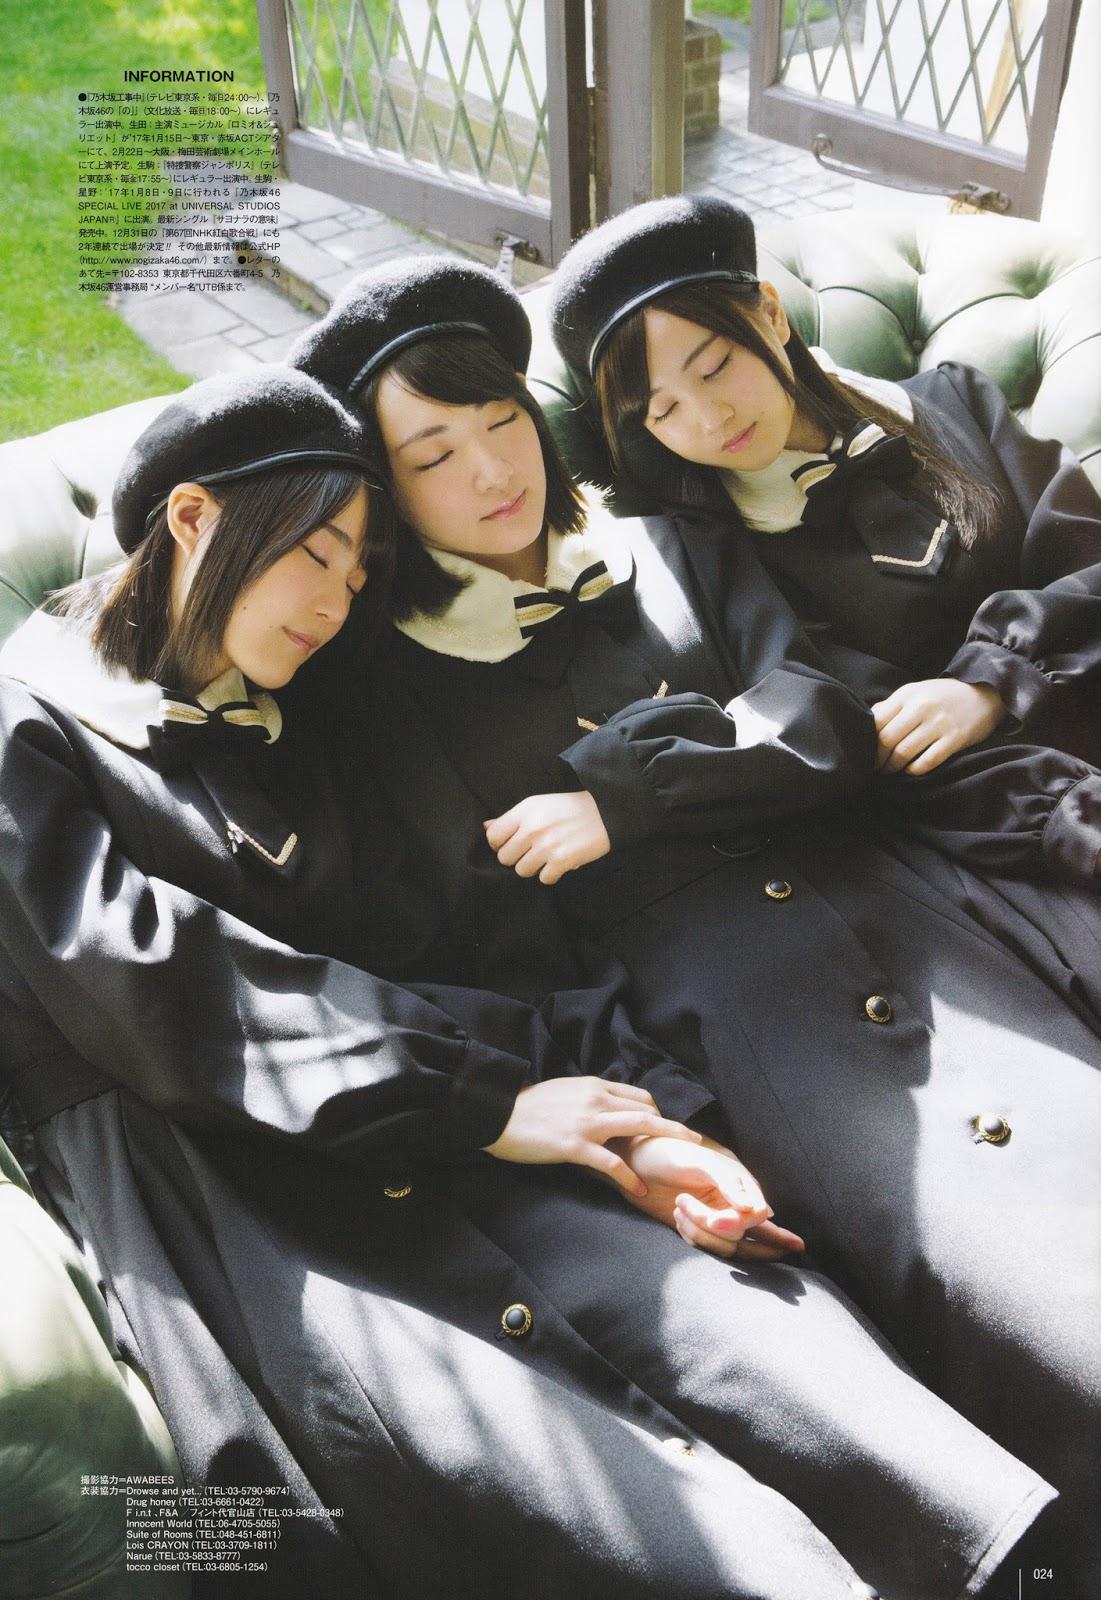 Ikuta Erika 生田絵梨花, Hoshino Minami 星野みなみ, Ikoma Rina 生駒里奈 Nogizaka46, UTB 2017.02 Vol.250 (アップ トゥ ボーイ 2017年2月号 Vol.250)